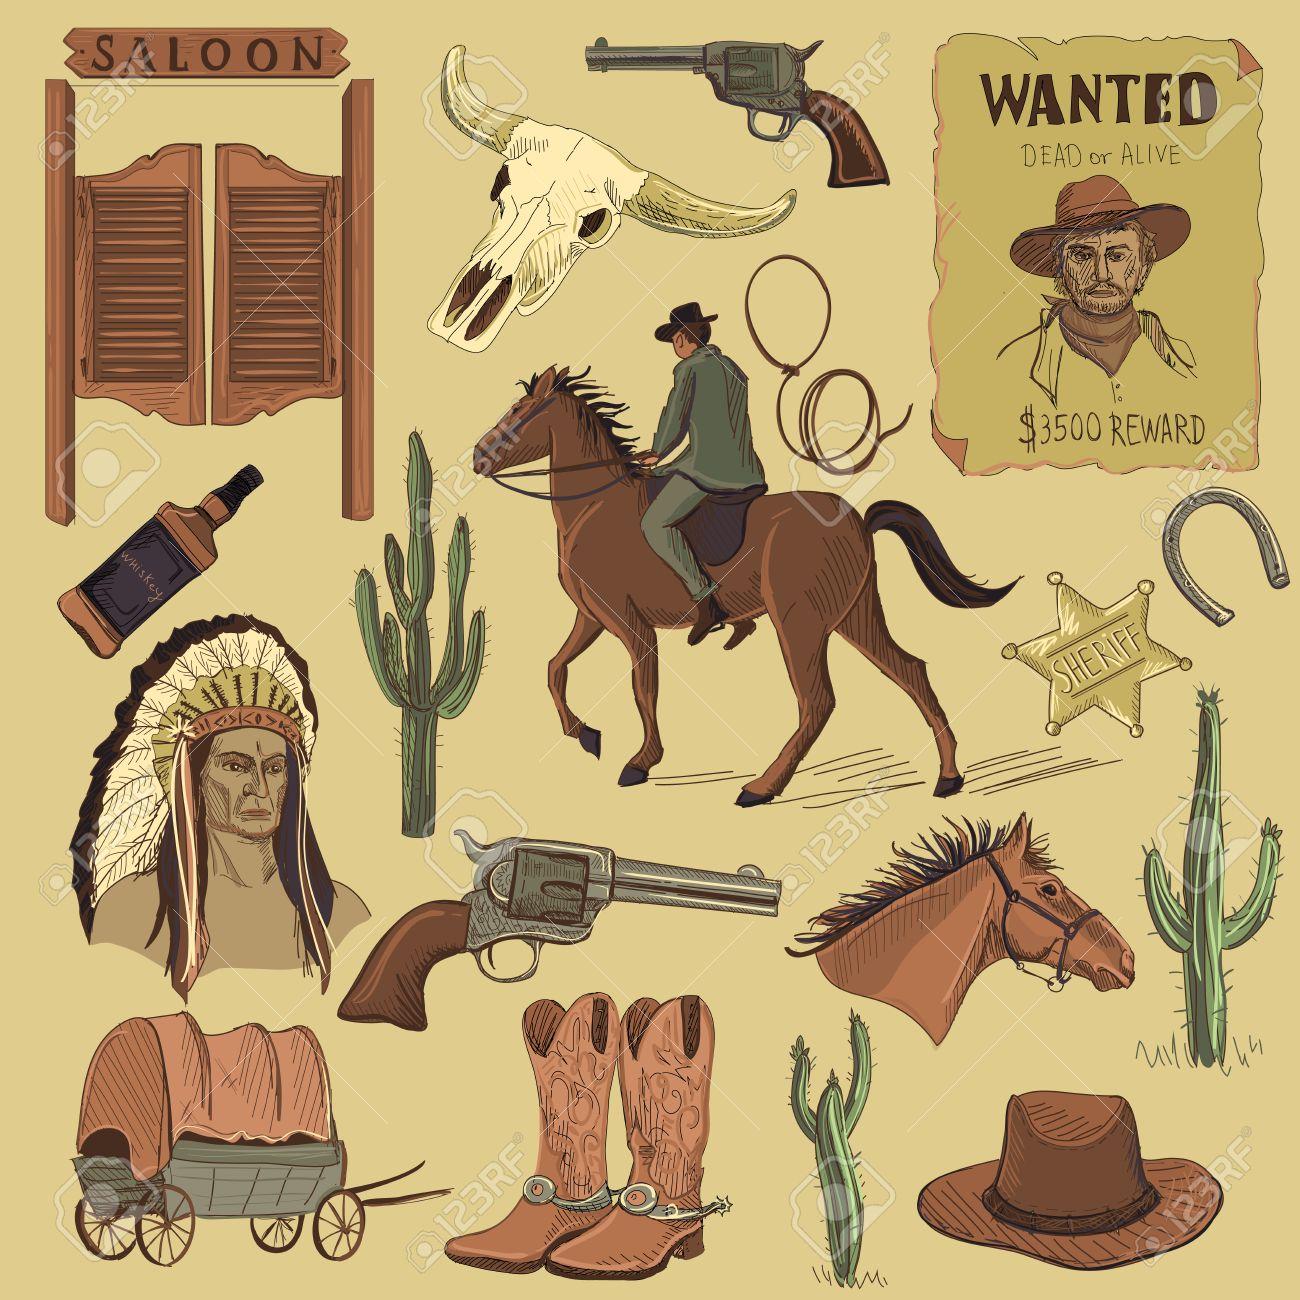 ffdeb47ffb8 Banque d images - Dessinés à la main Wild West icônes fixés avec des  revolvers